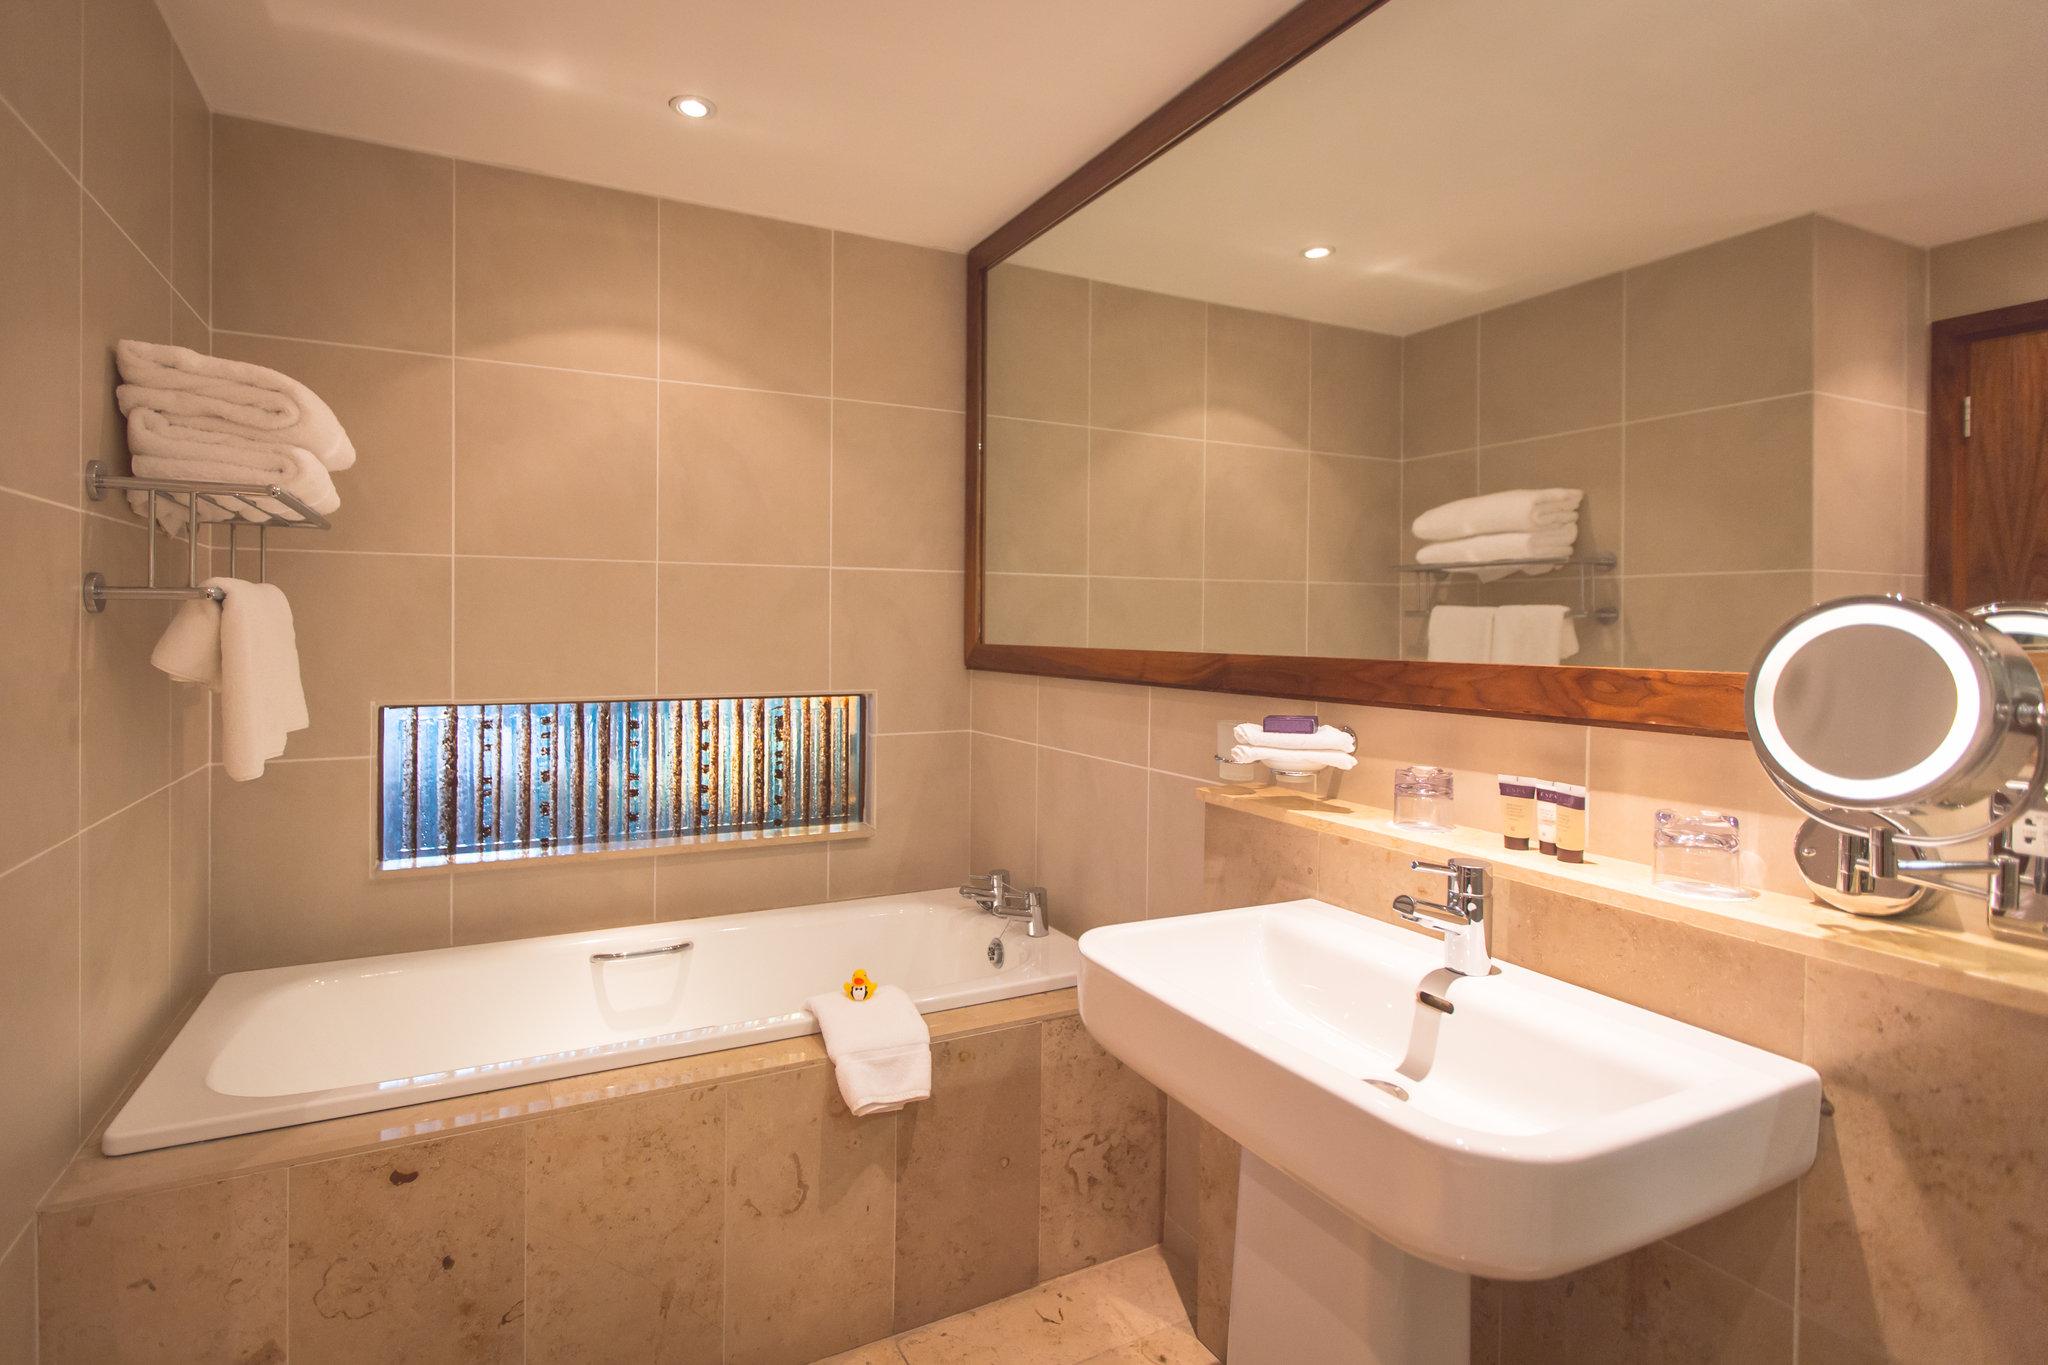 Executive Super King Room Bathroom